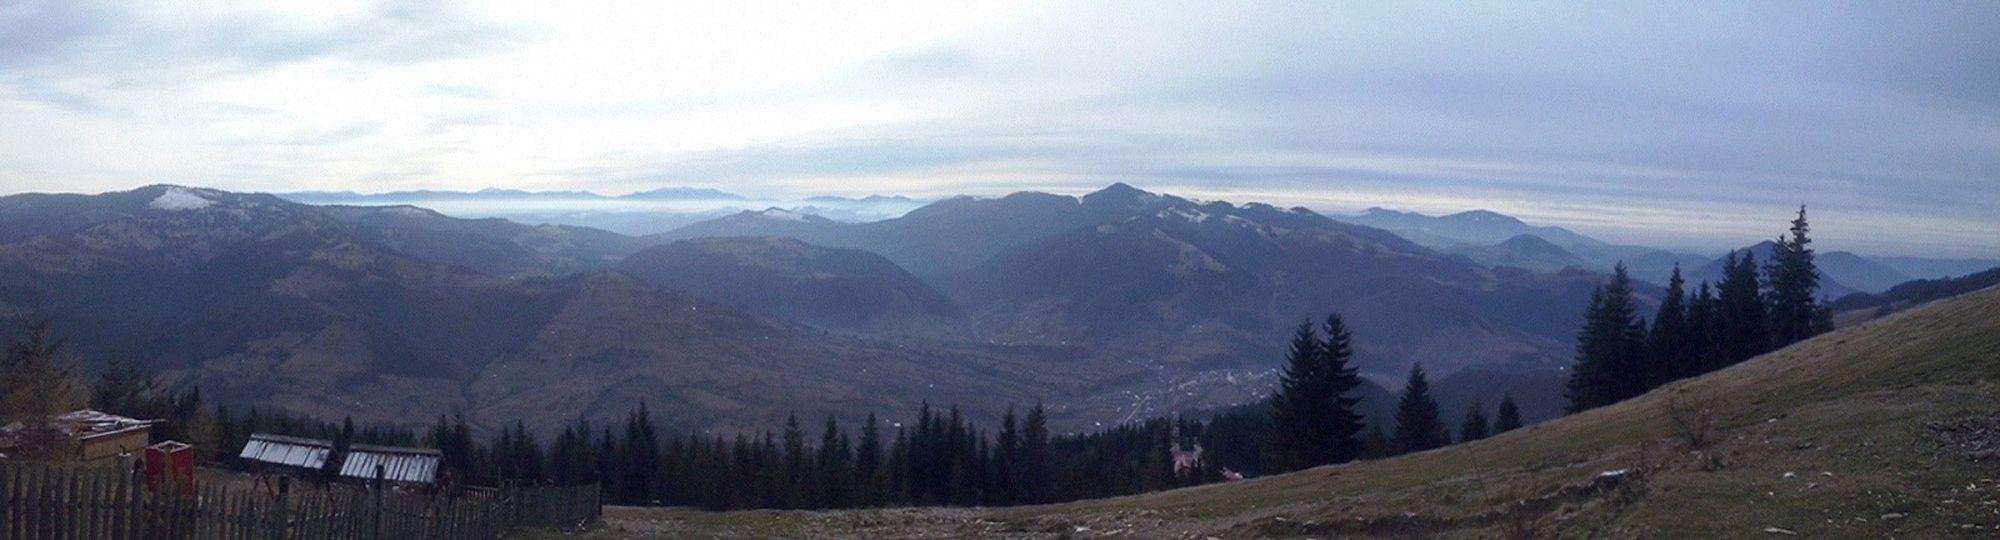 Panorama Mountains Autumn